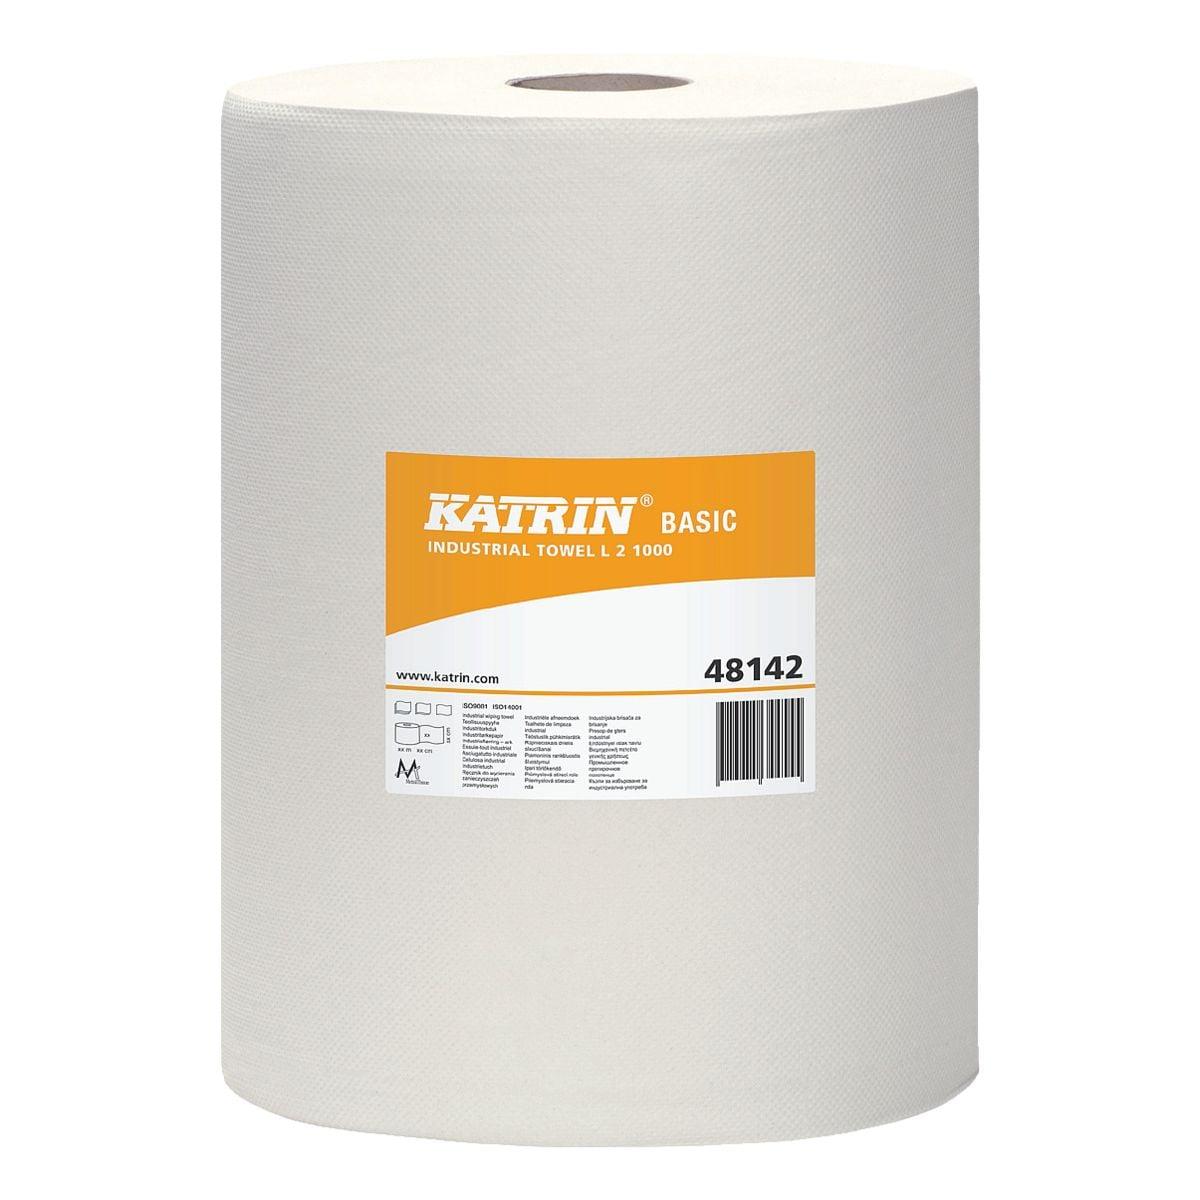 Katrin Papier-Putztuchrolle weiß 2-lagig 22x38 cm (2x1000 Blatt)